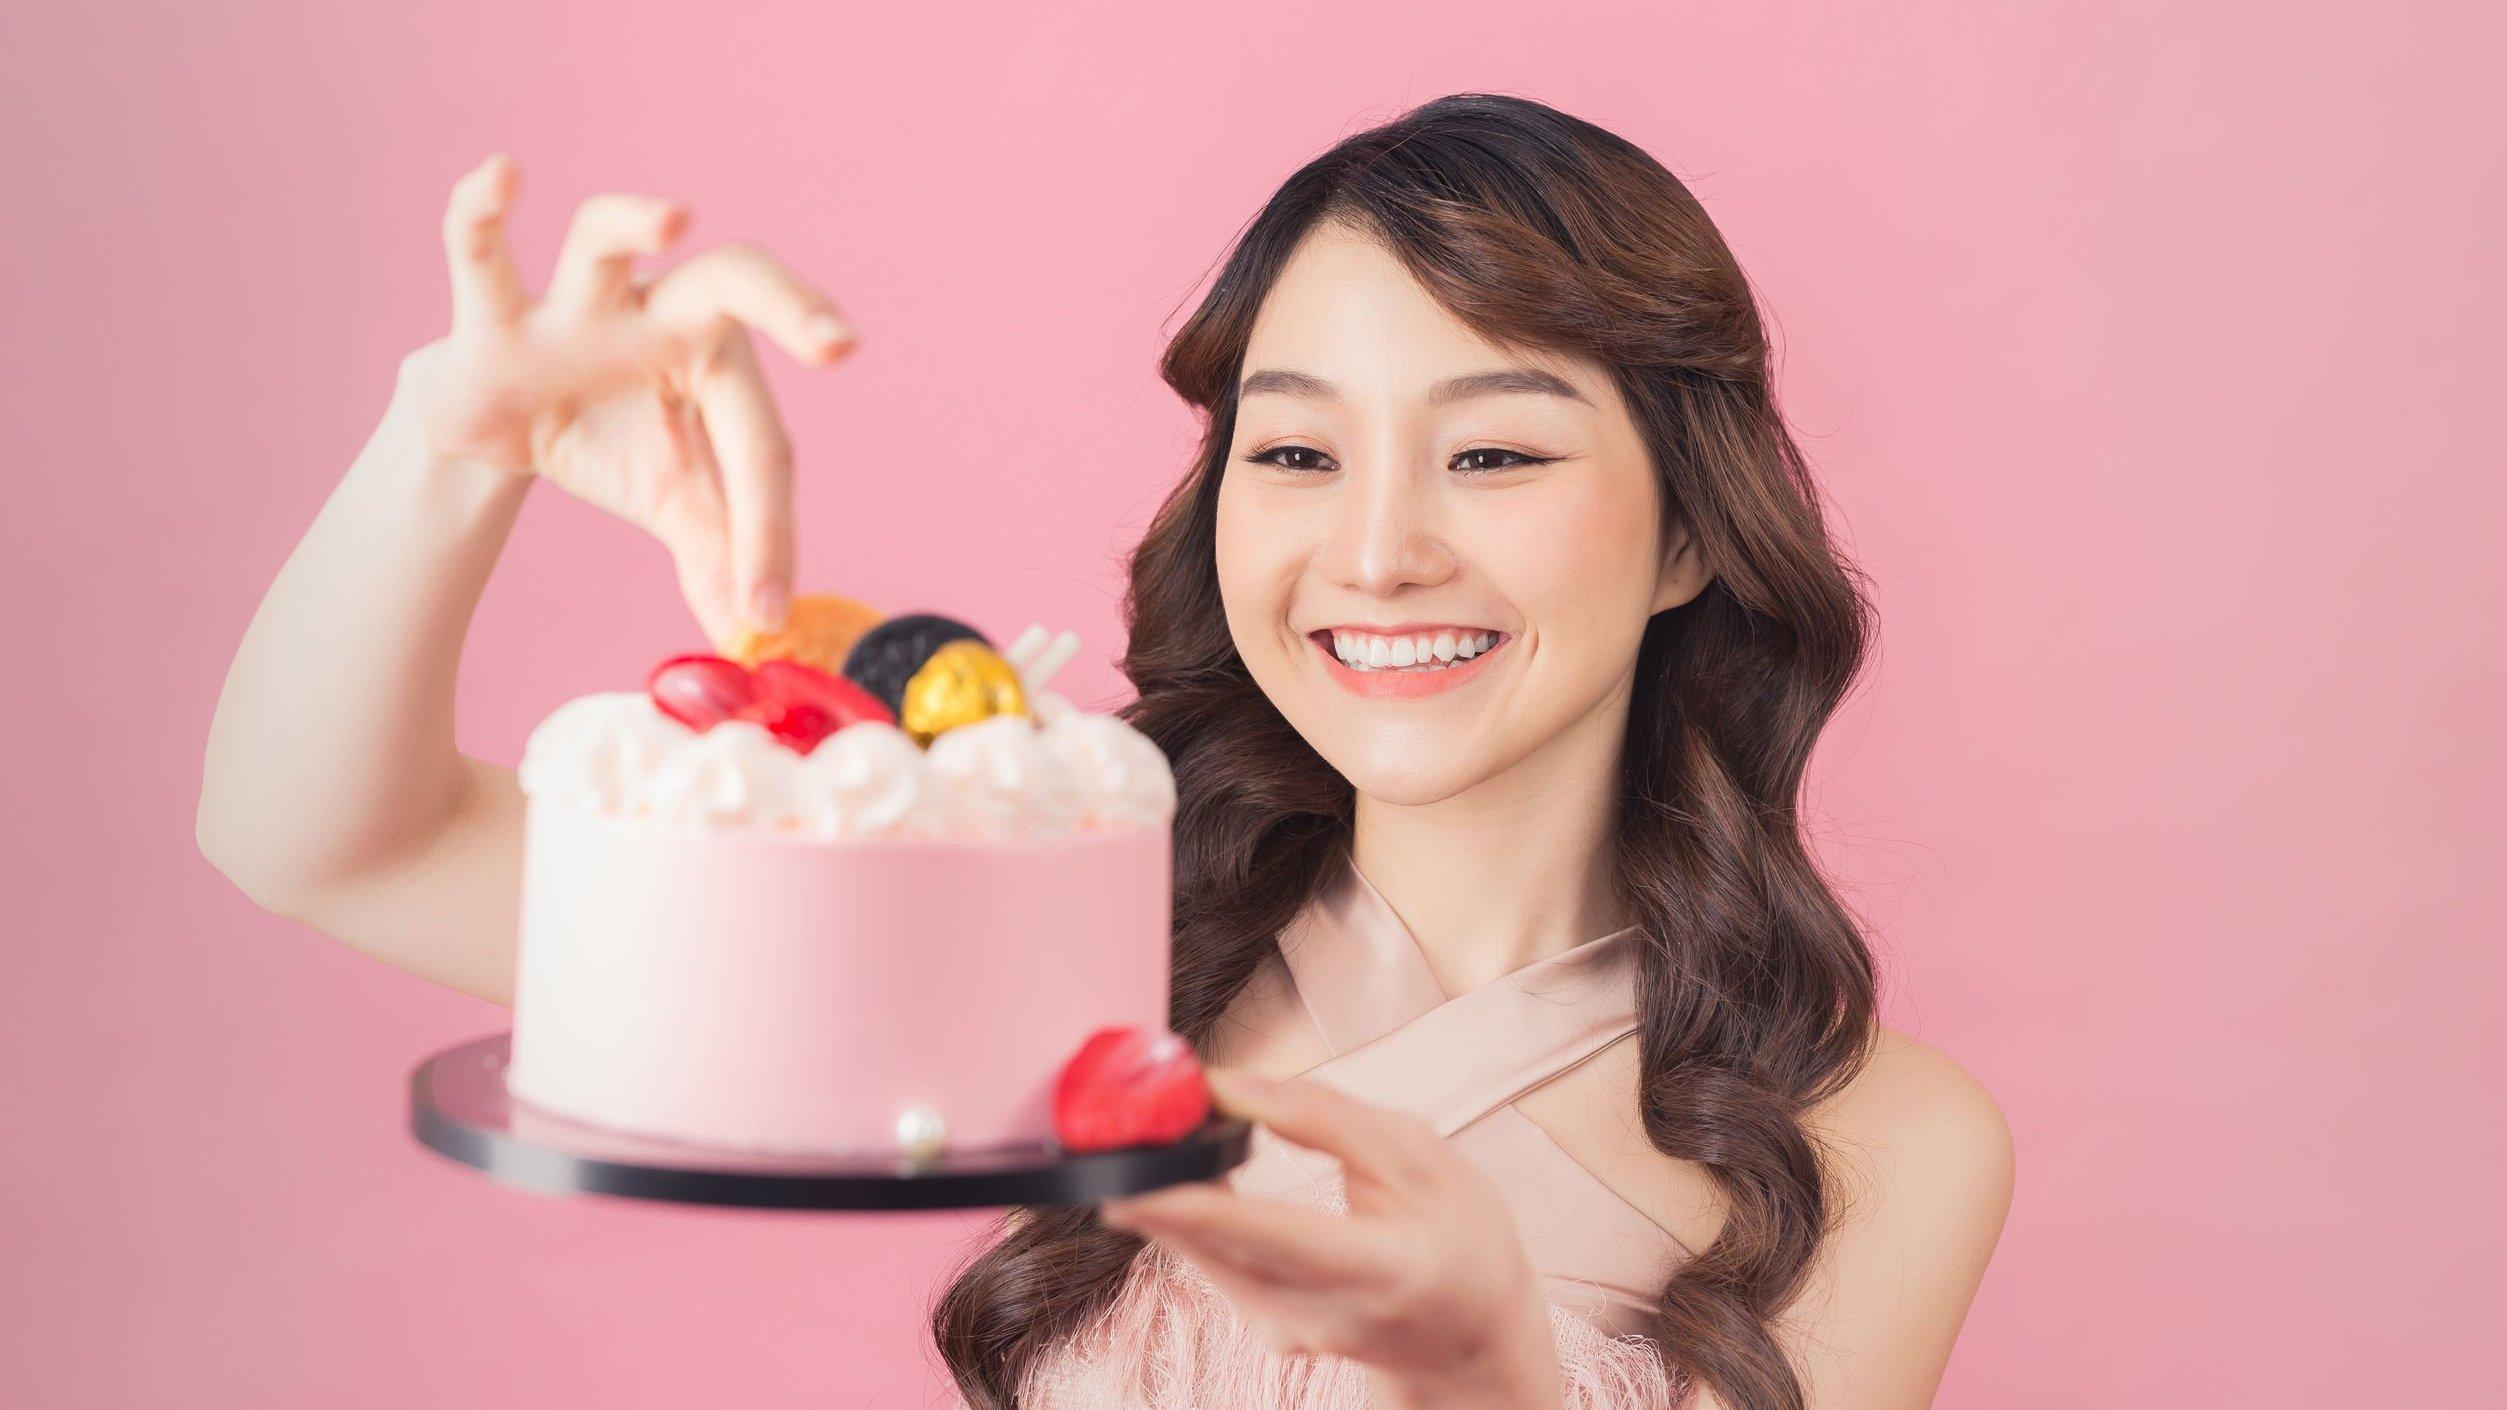 Menina sorrindo, segurando bolo de aniversário.